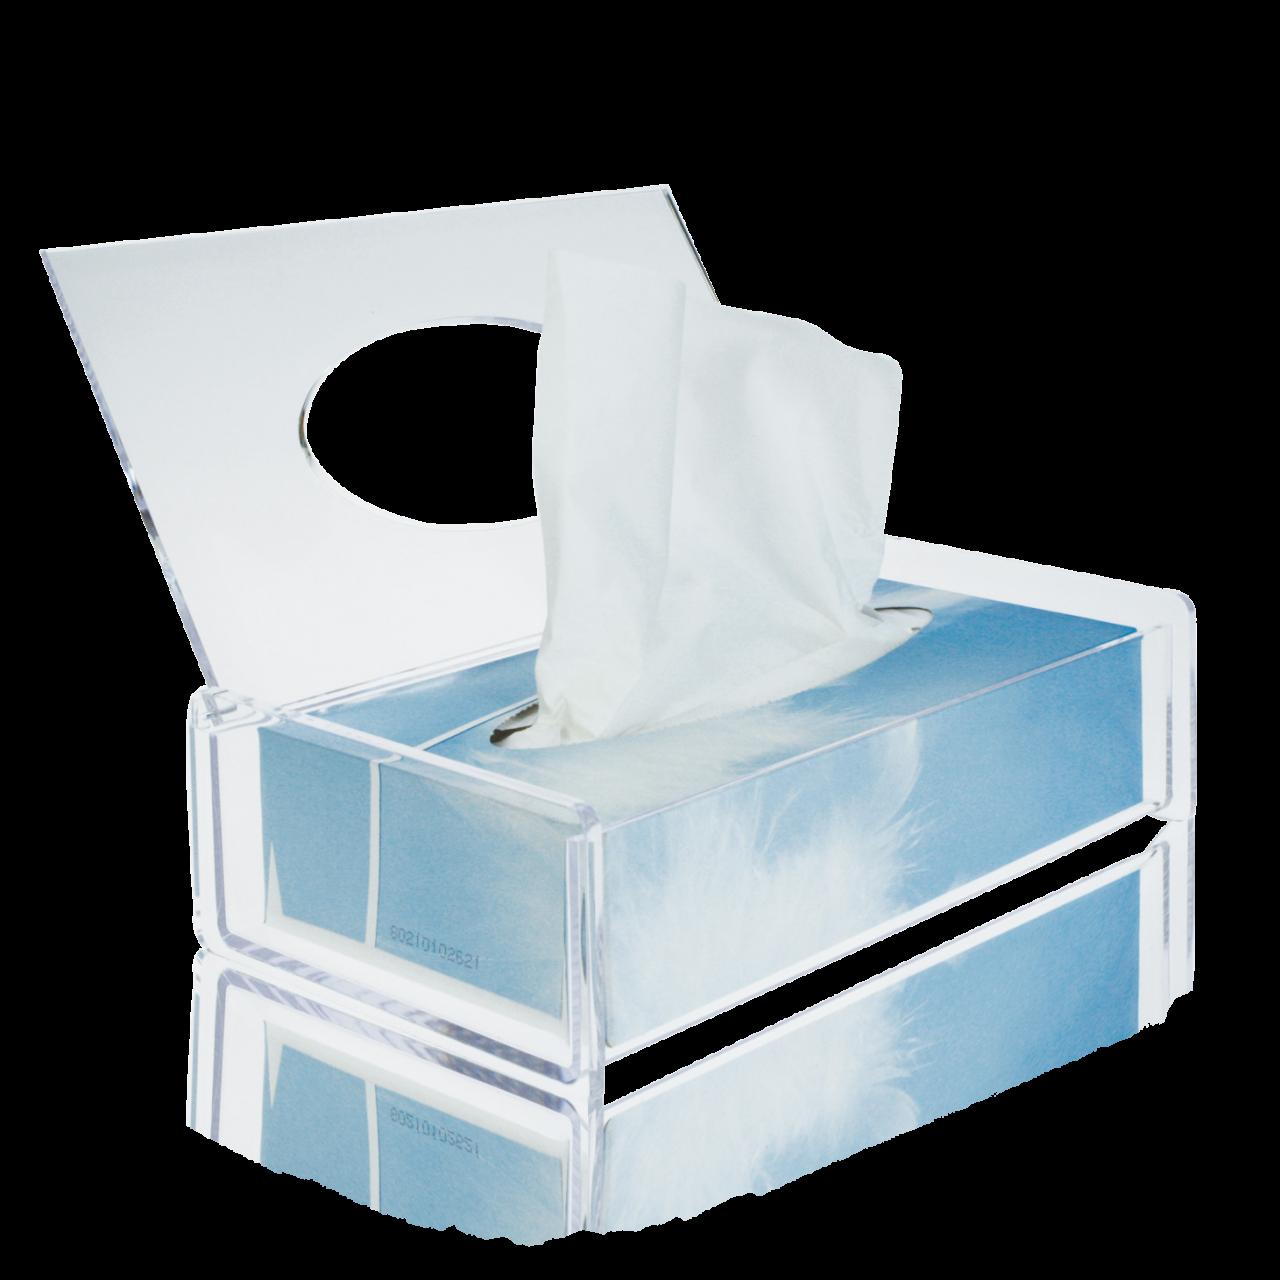 Box für Kosmetiktücher, transparent 25 x 13 x 6 cm